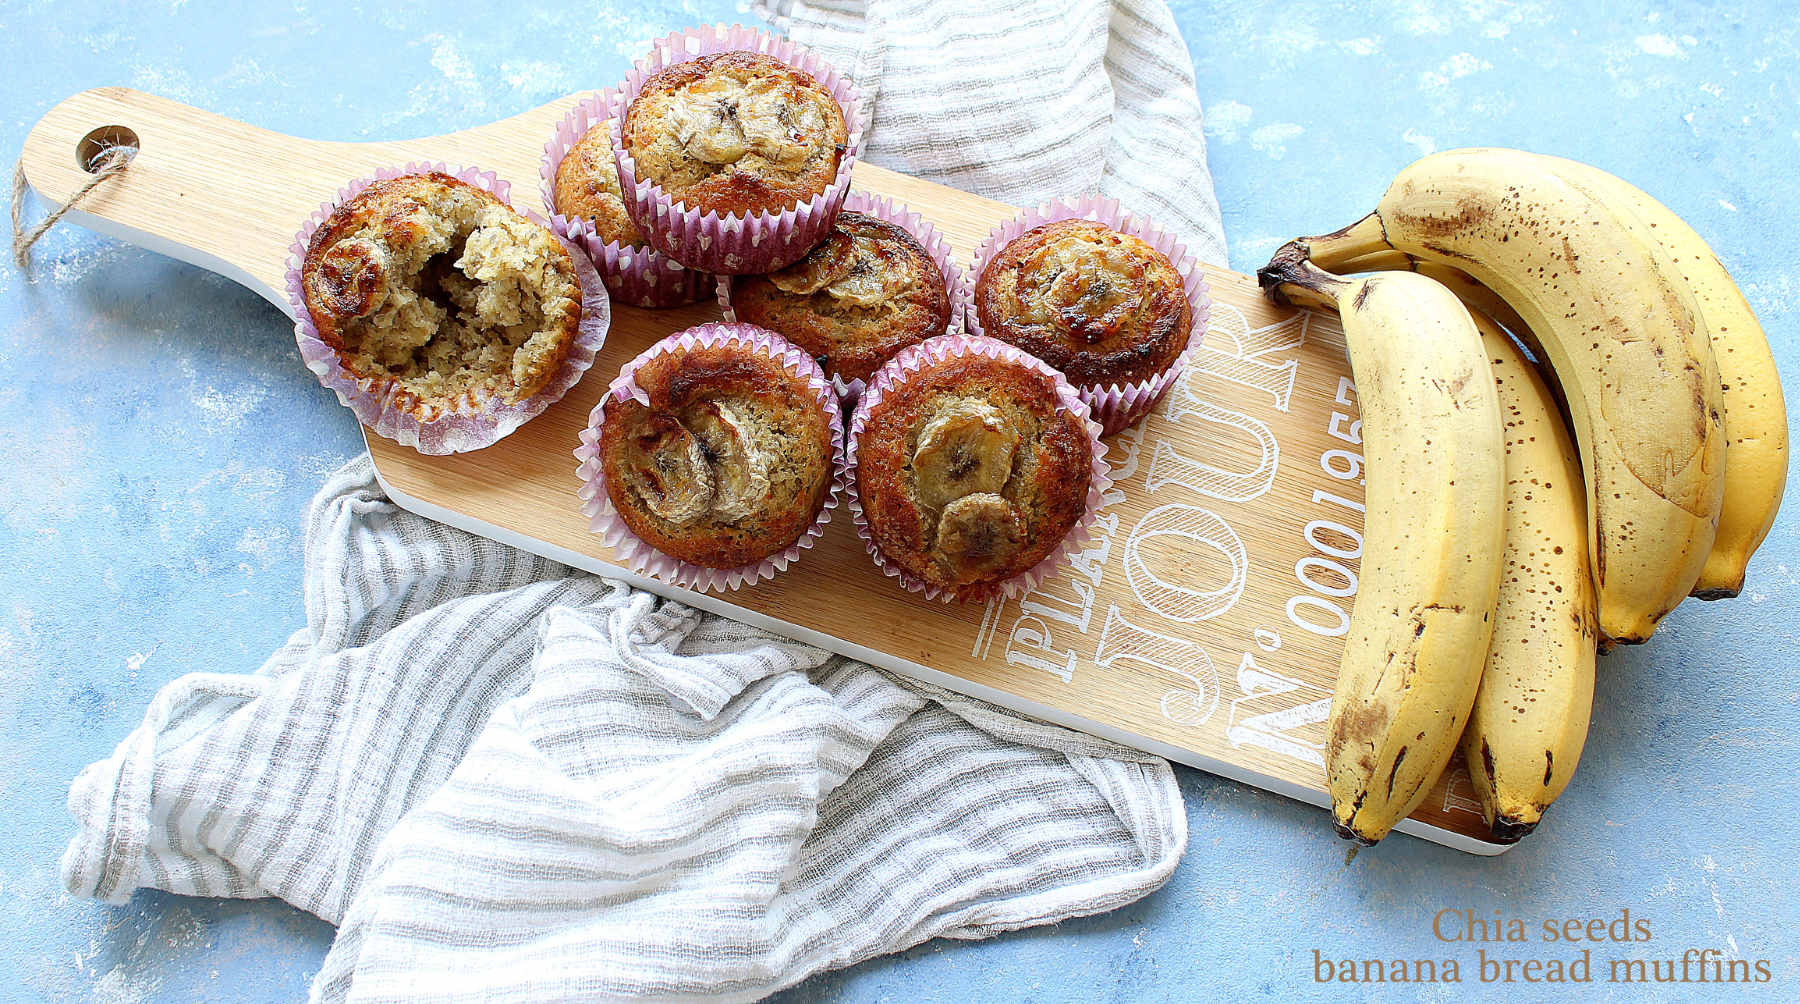 Chia seeds banana bread muffins